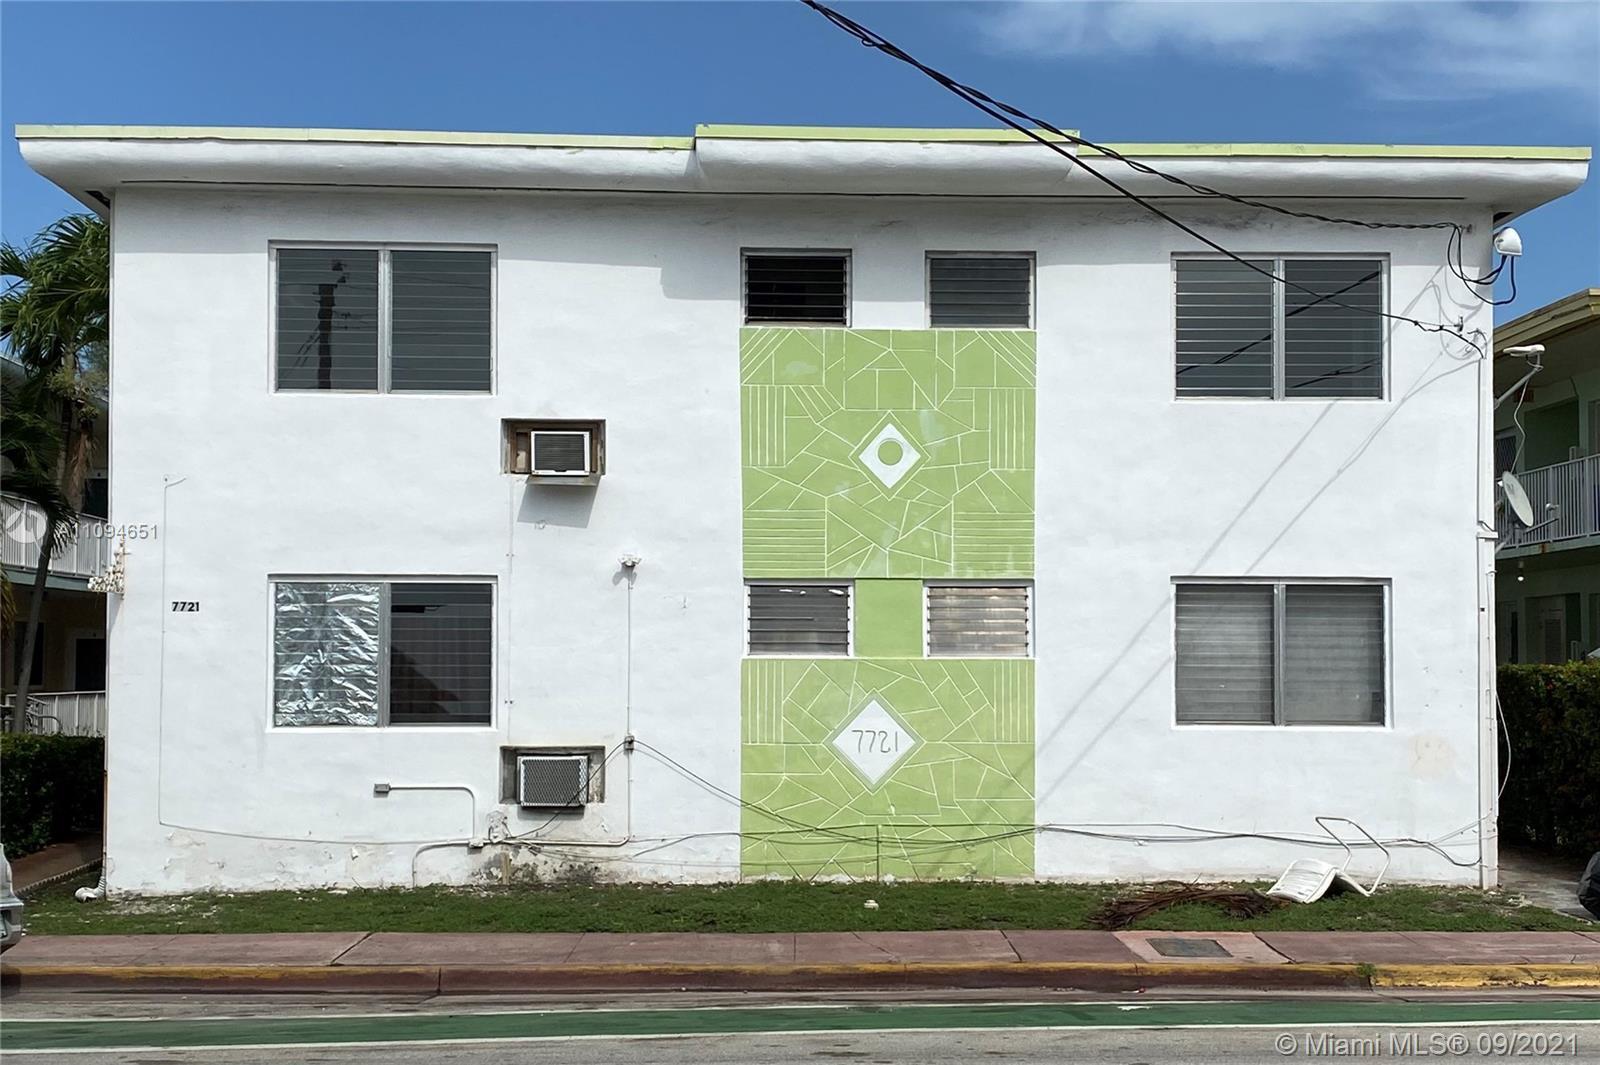 7721 Dickens Ave, Miami Beach, Florida 33141